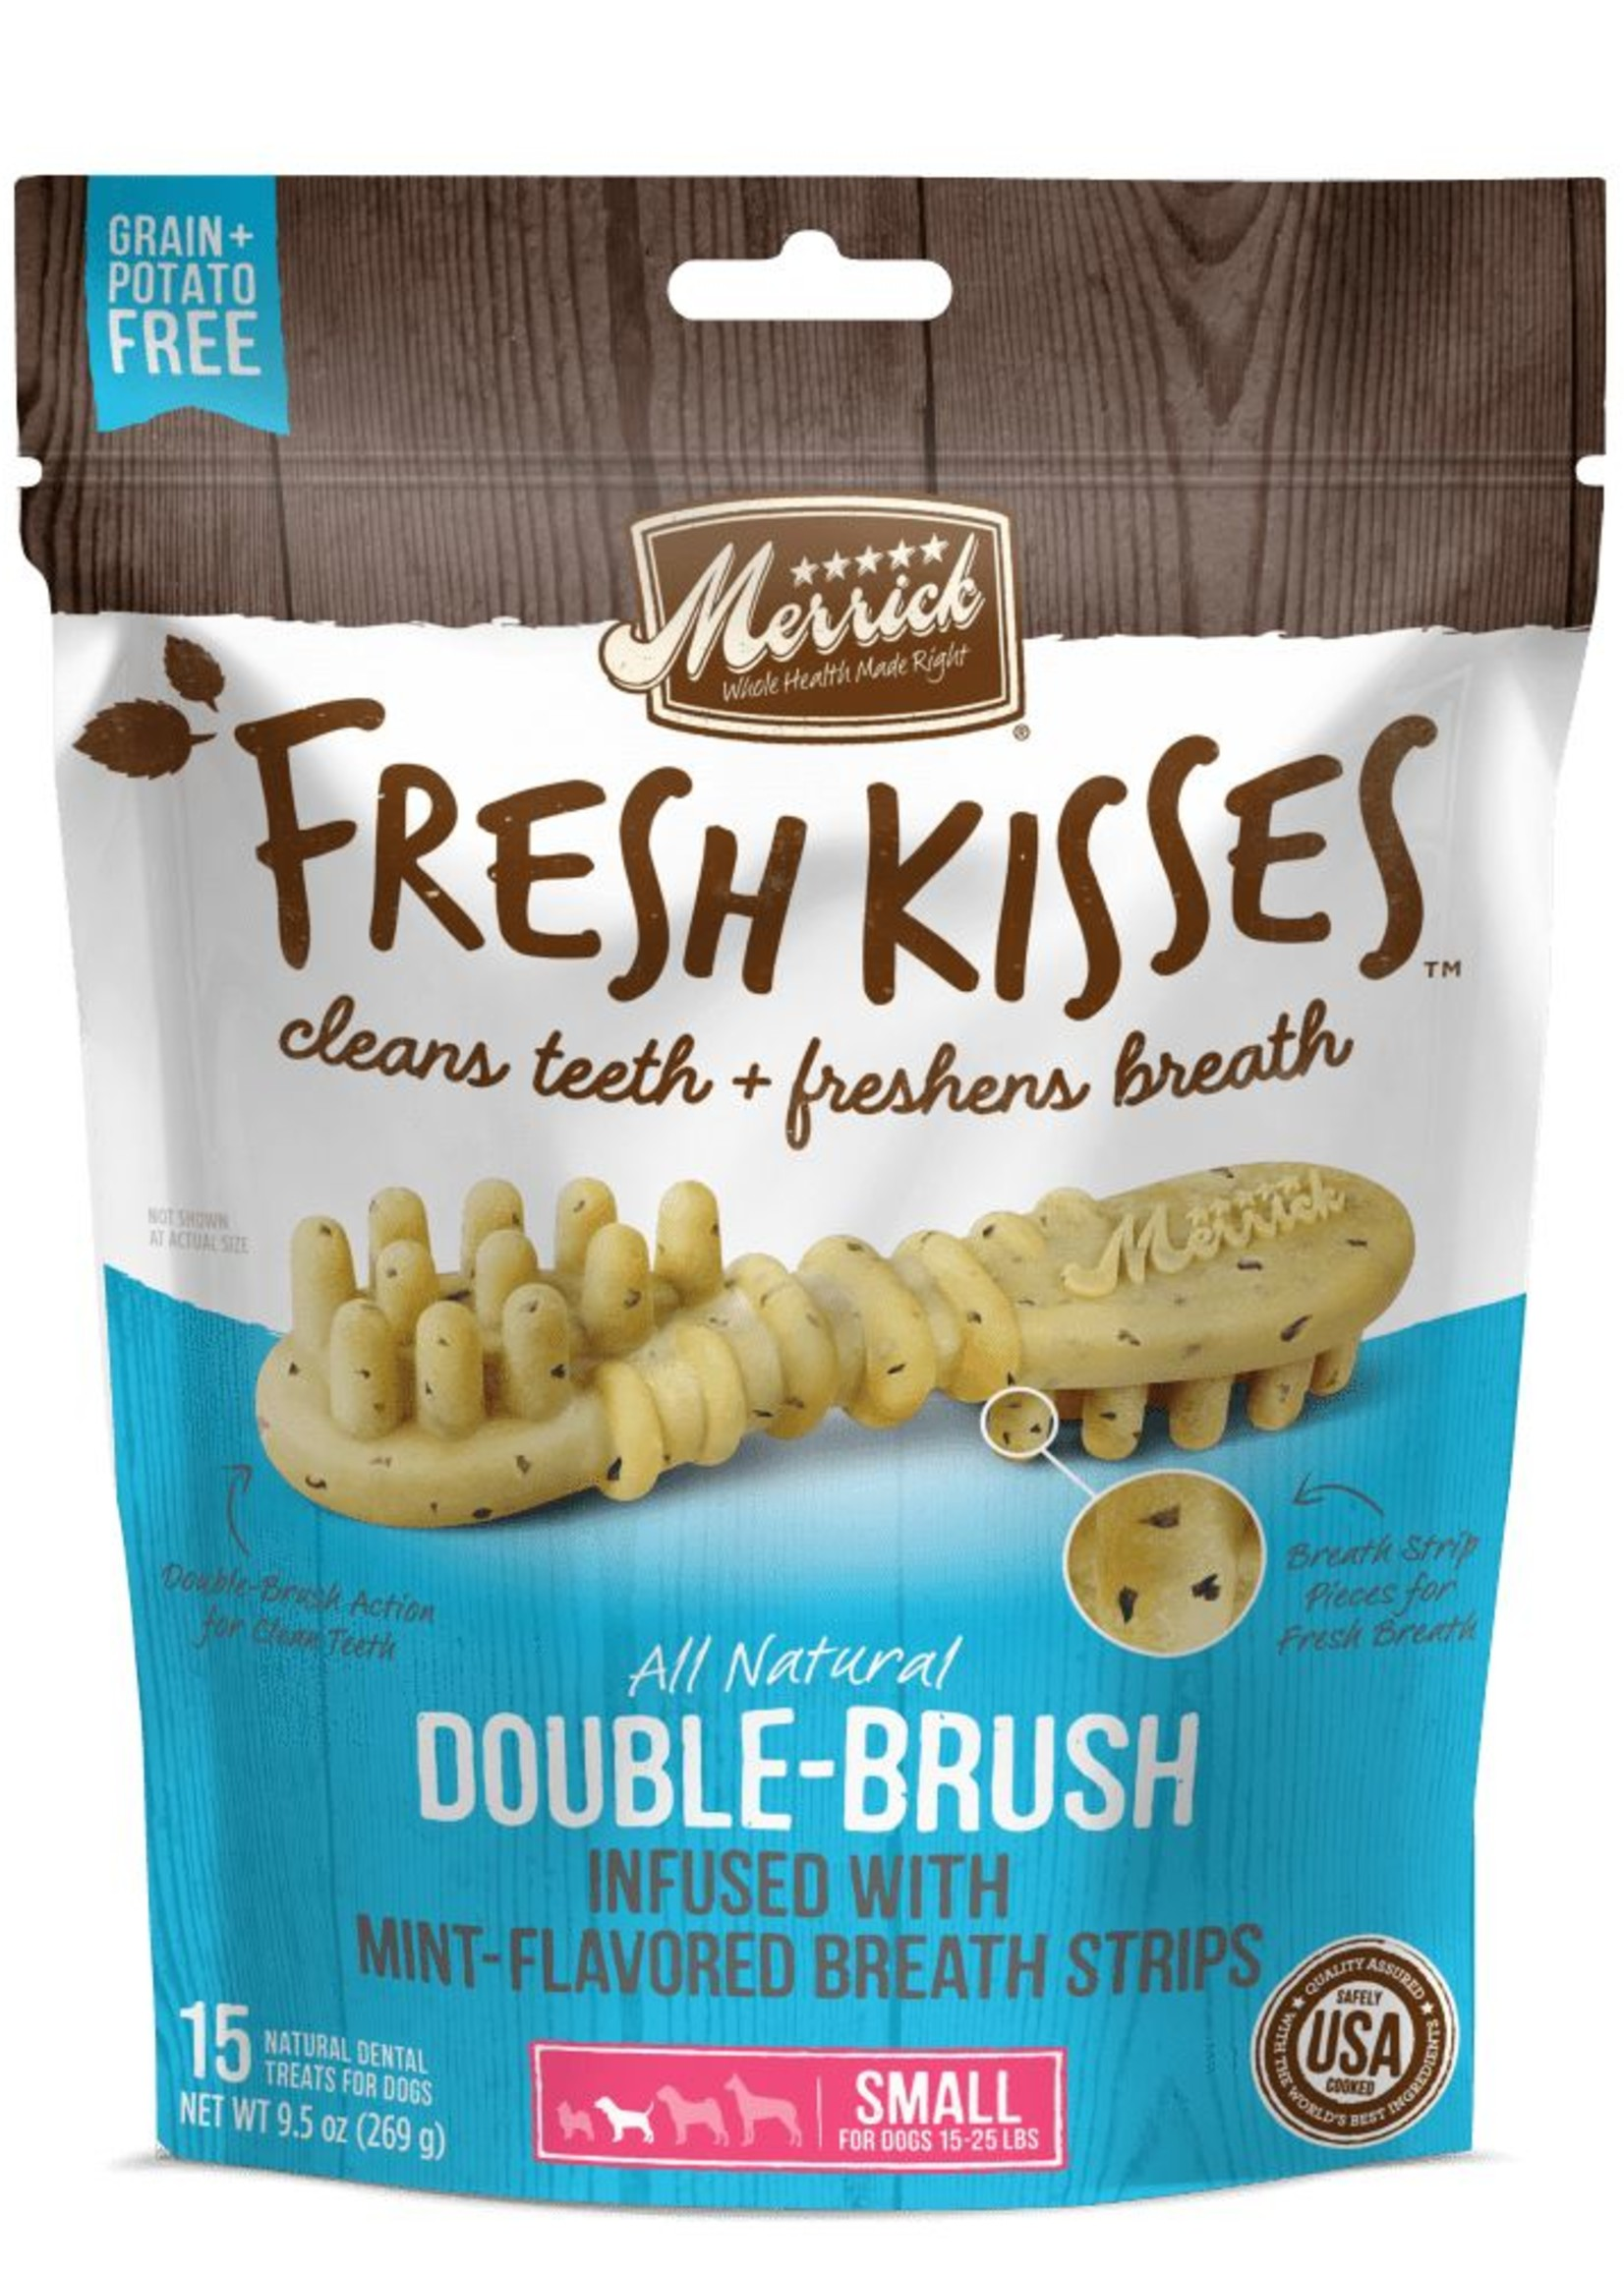 Merrick Pet Care, Inc. Merrick Fresh Kisses Mint-Flavored Breath Strips Small 9ct